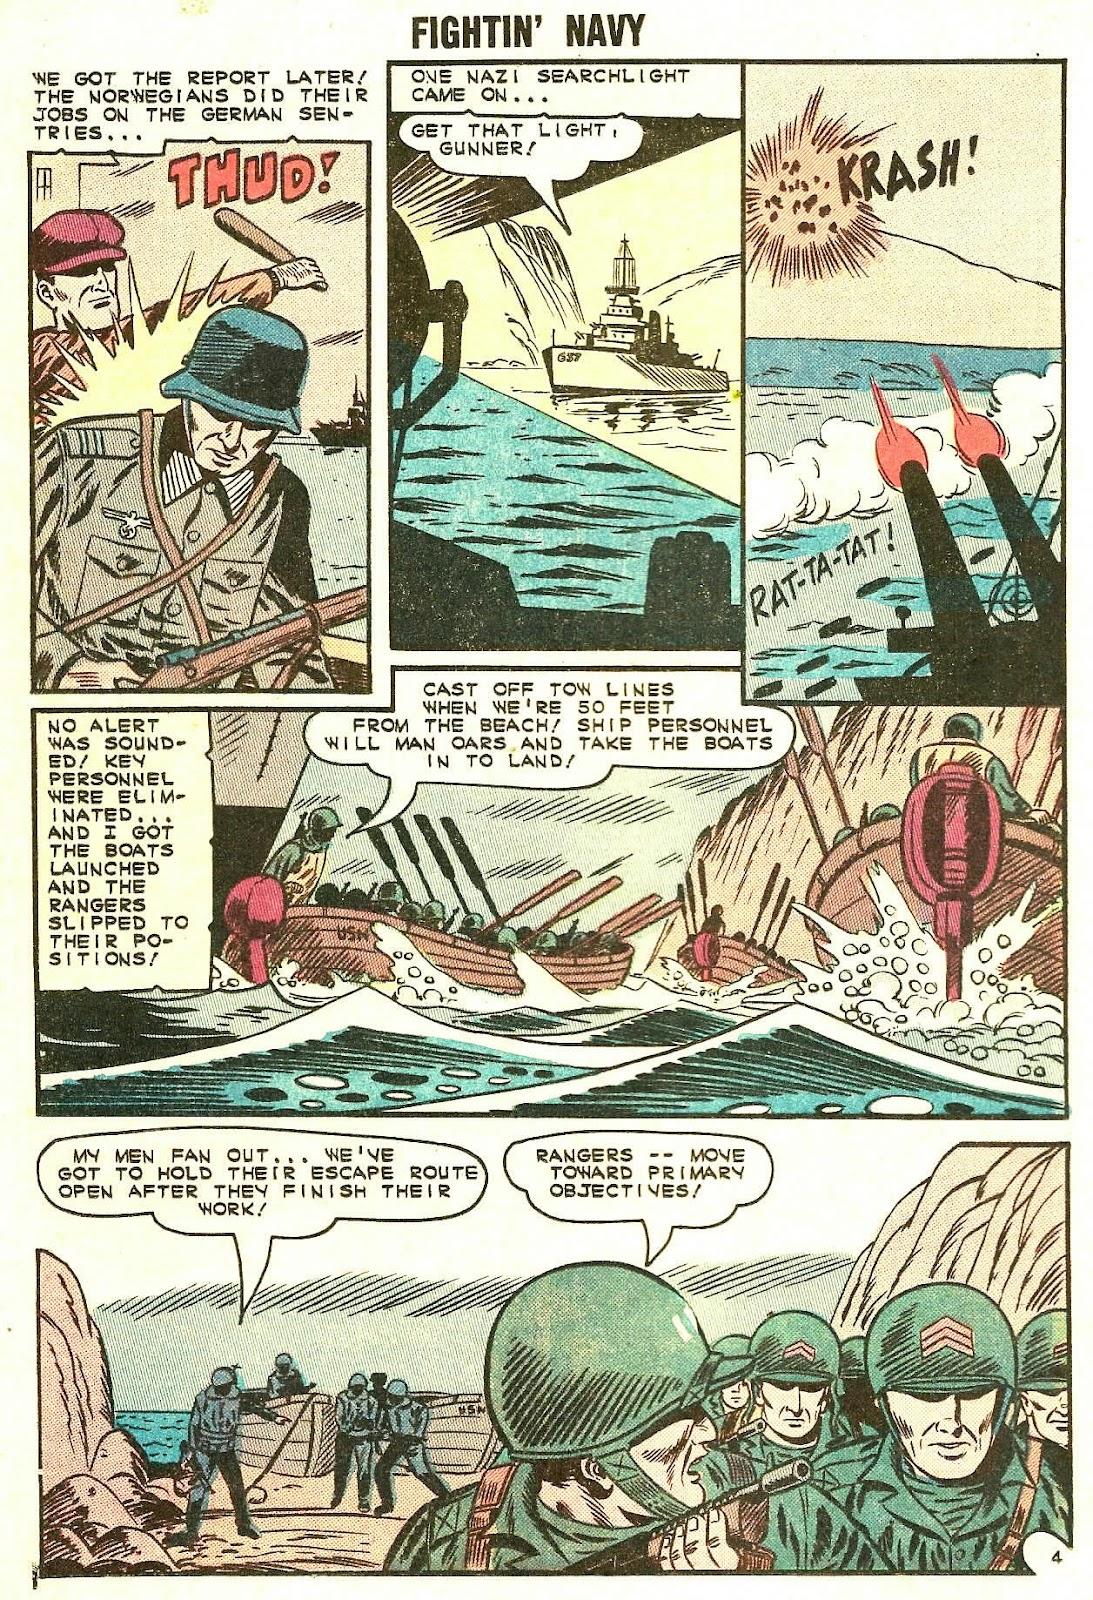 Read online Fightin' Navy comic -  Issue #119 - 16